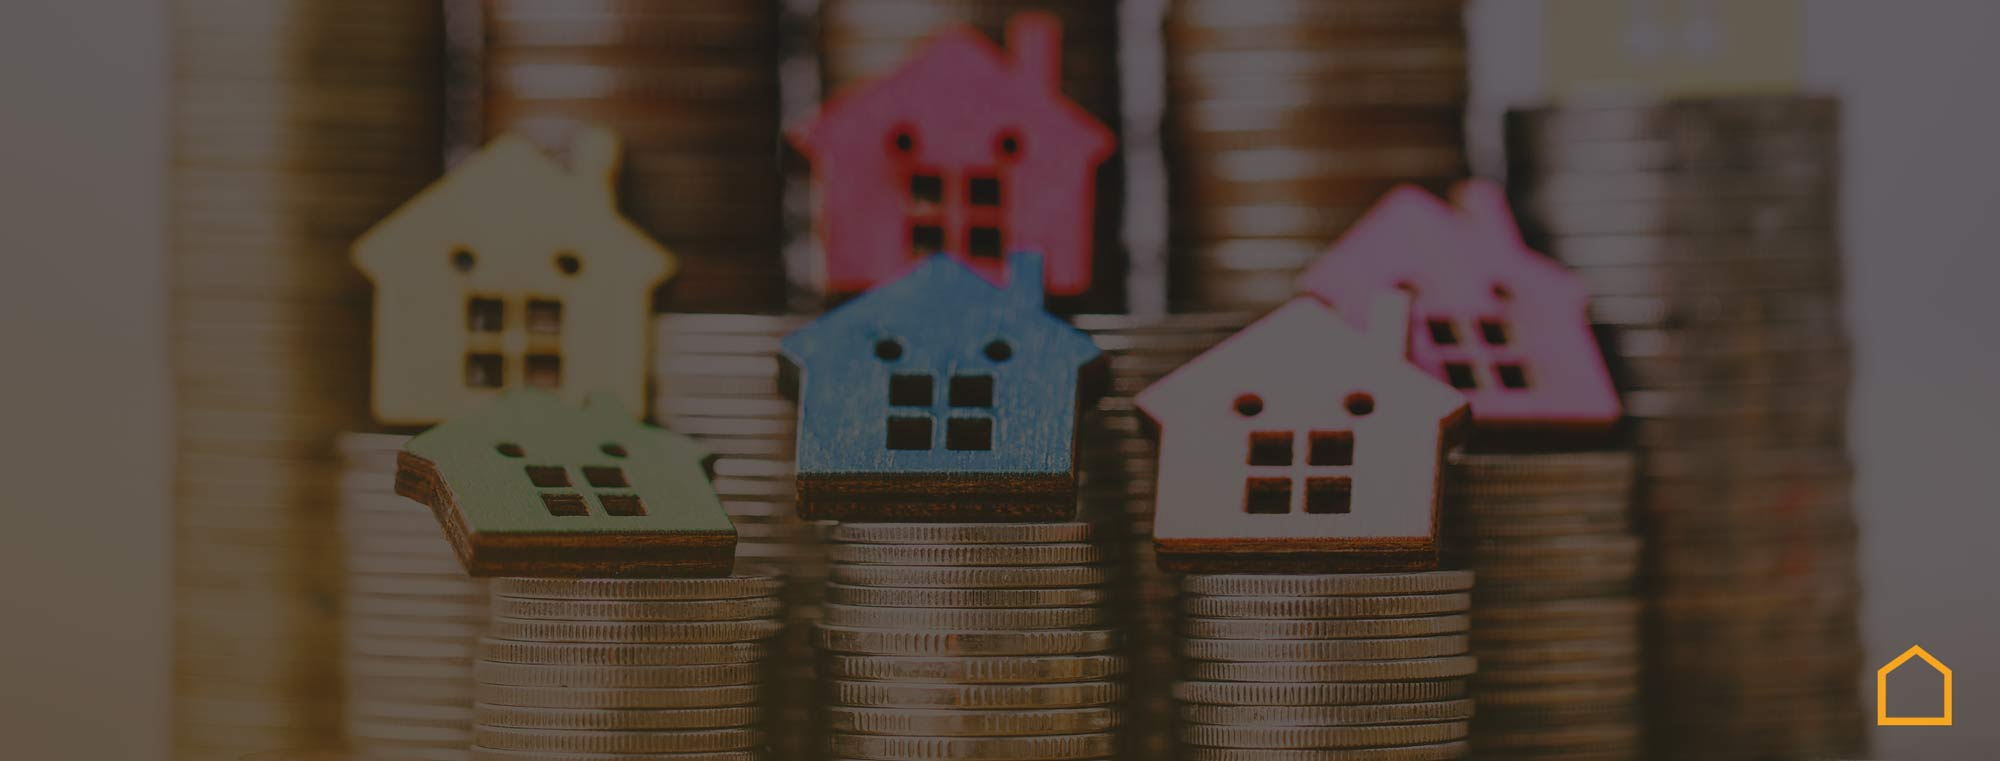 city immobilienmakler immobilie aktien